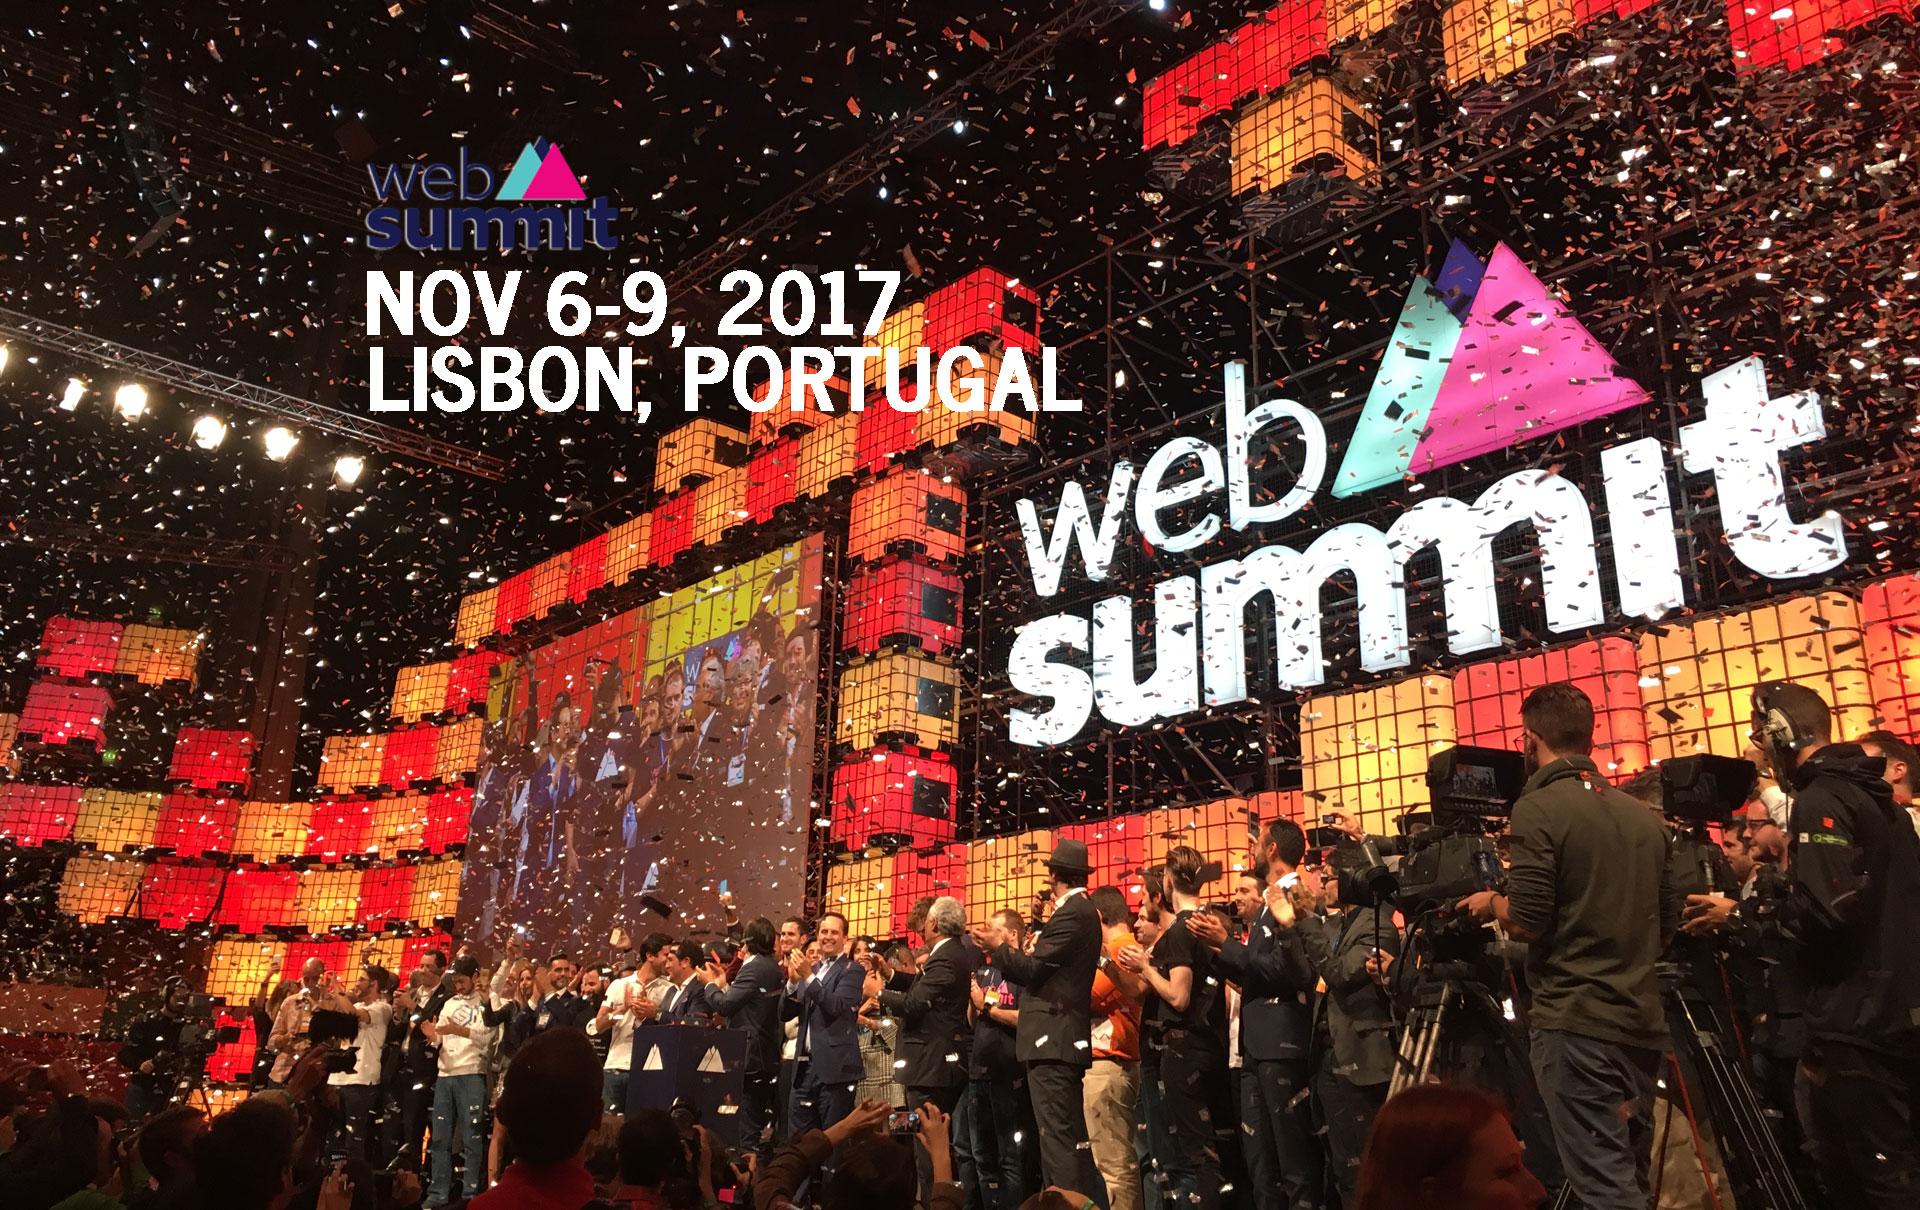 Web Summit 2017 Nov 6-9 Lisbon Portugal